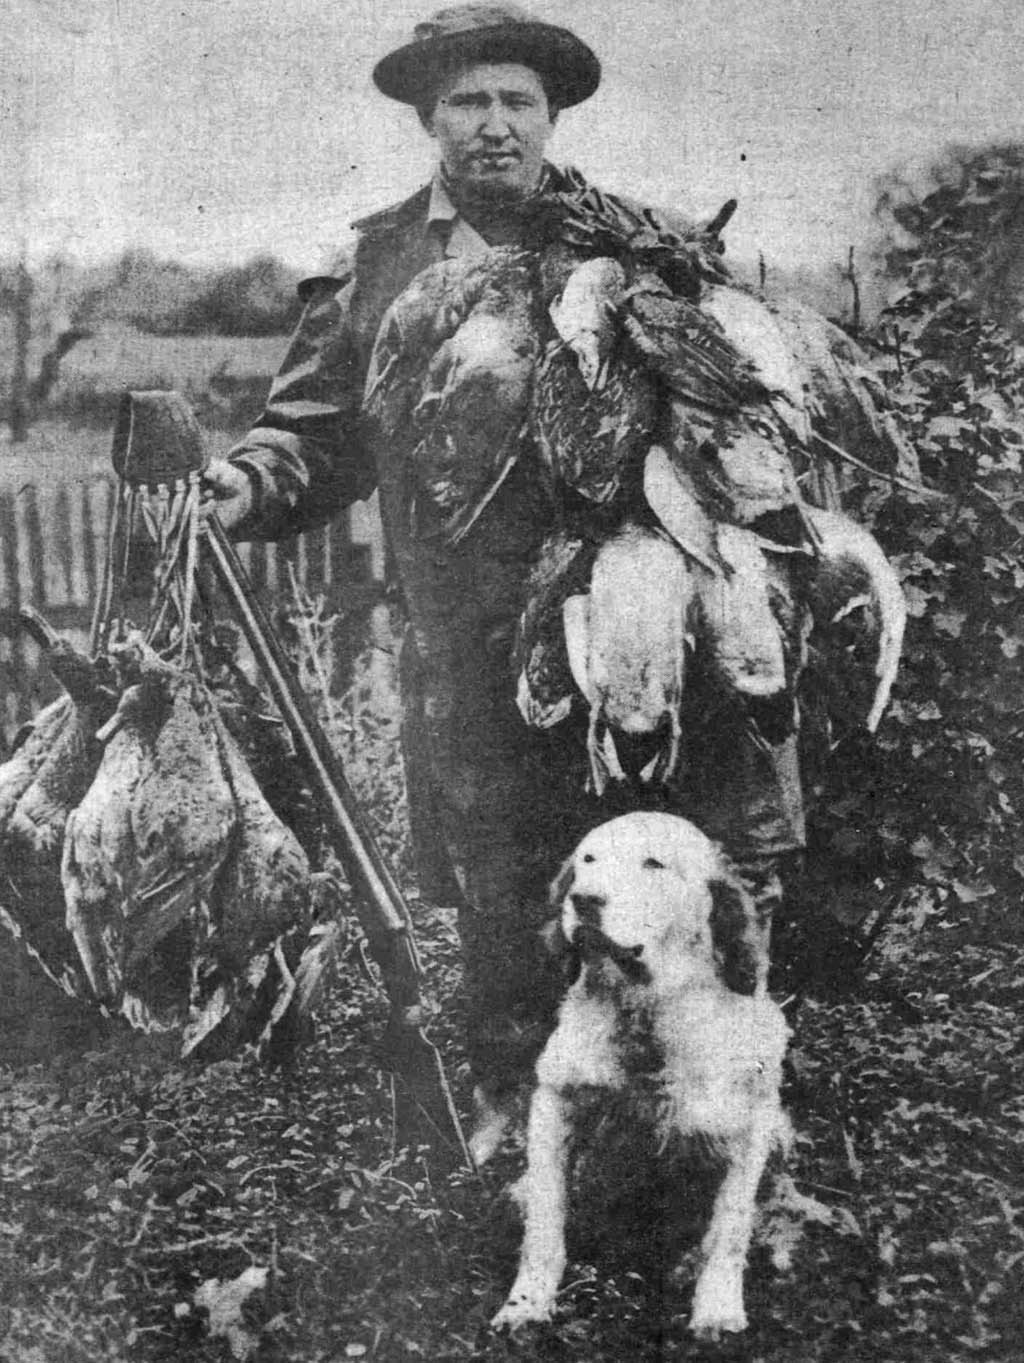 oregon duck hunter